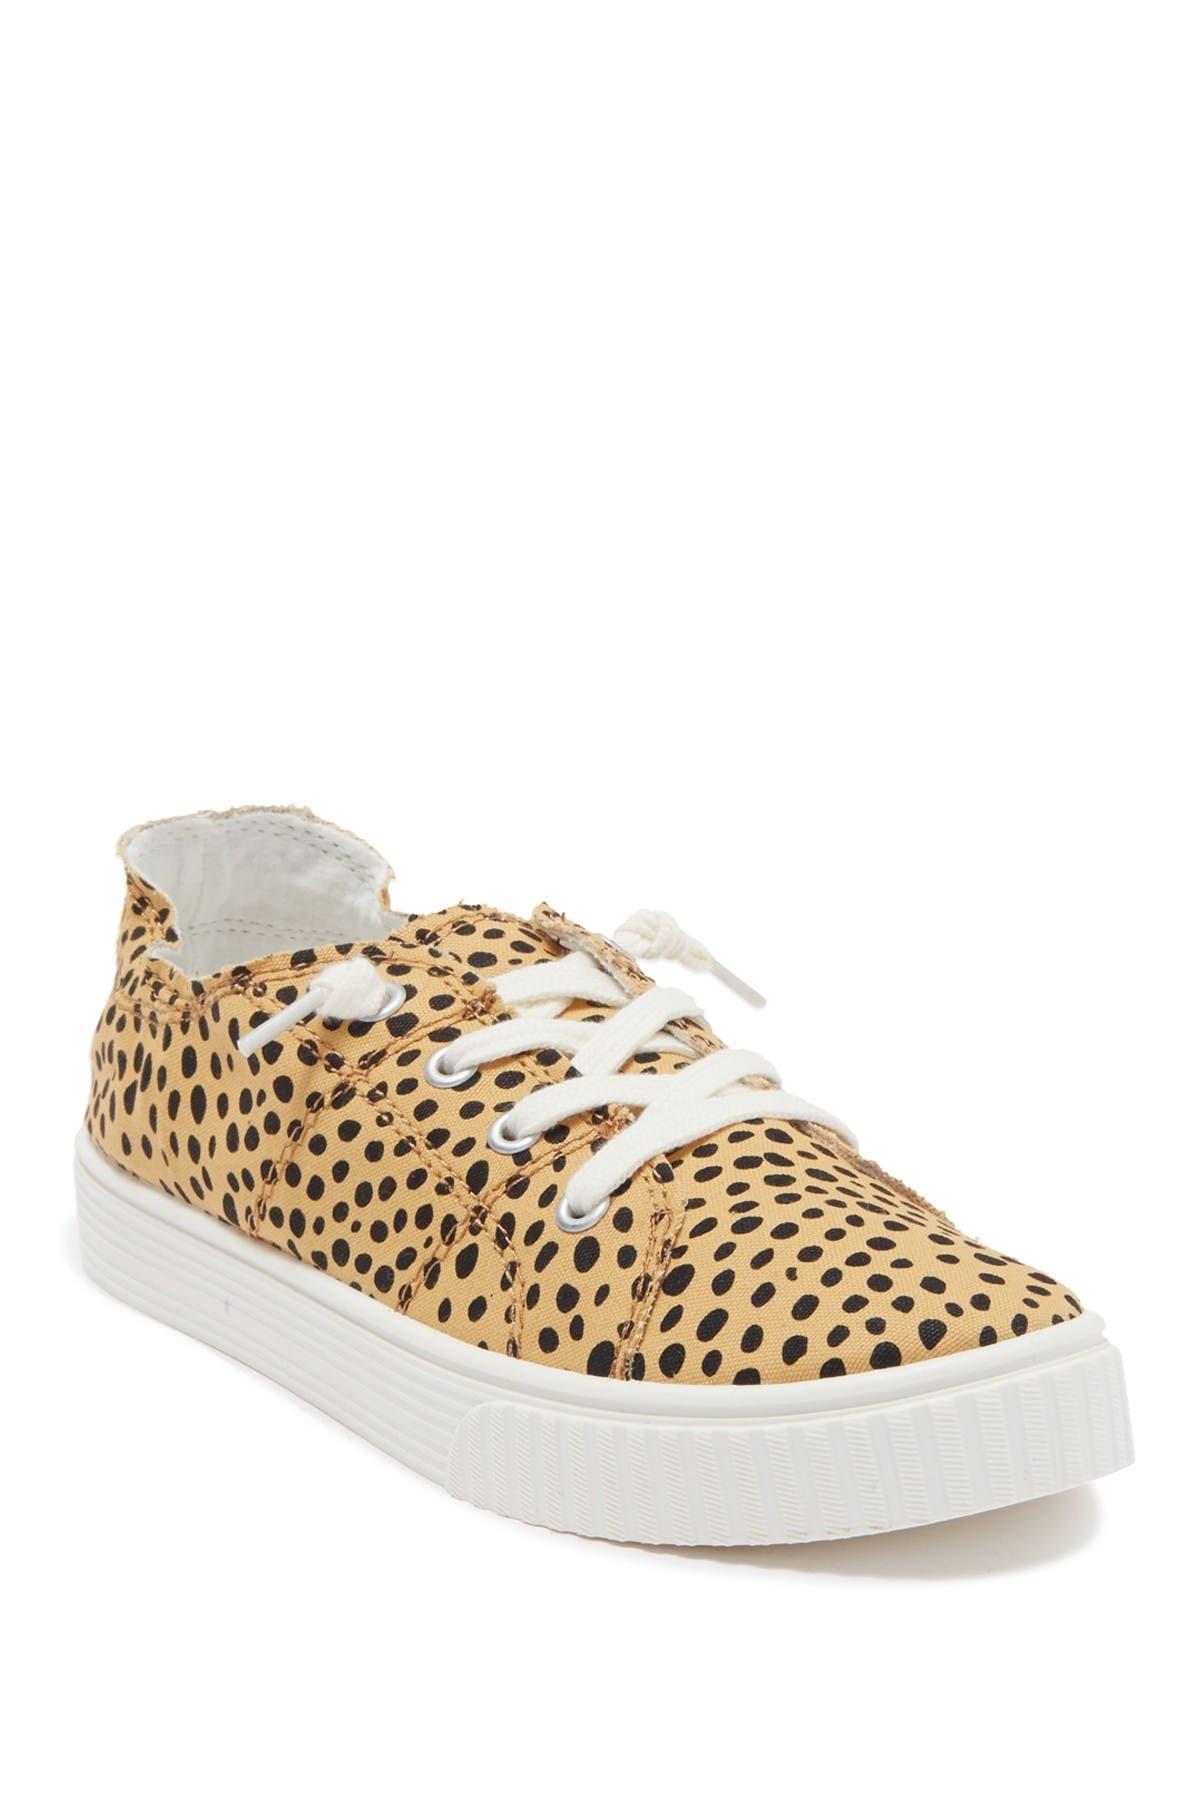 https slickdeals net f 15055939 women s shoes madden girl maris slip on sneaker 7 86 mia auden snakeskin ankle bootie 11 23 more free store pickup at nordstrom rack or fs on 89